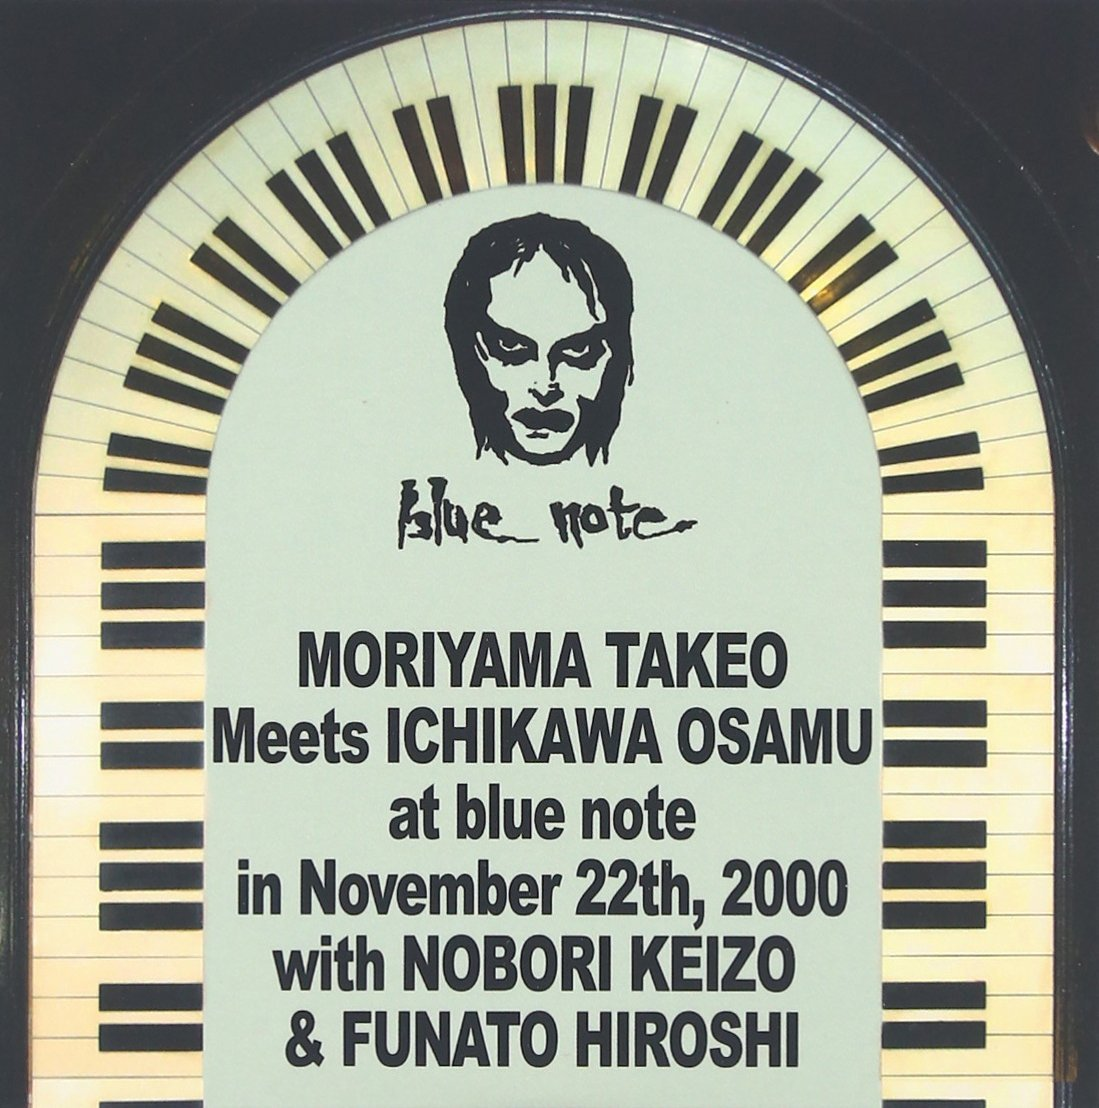 MORIYAMA TAKEO Meets ICHIKAWA OSAMU画像